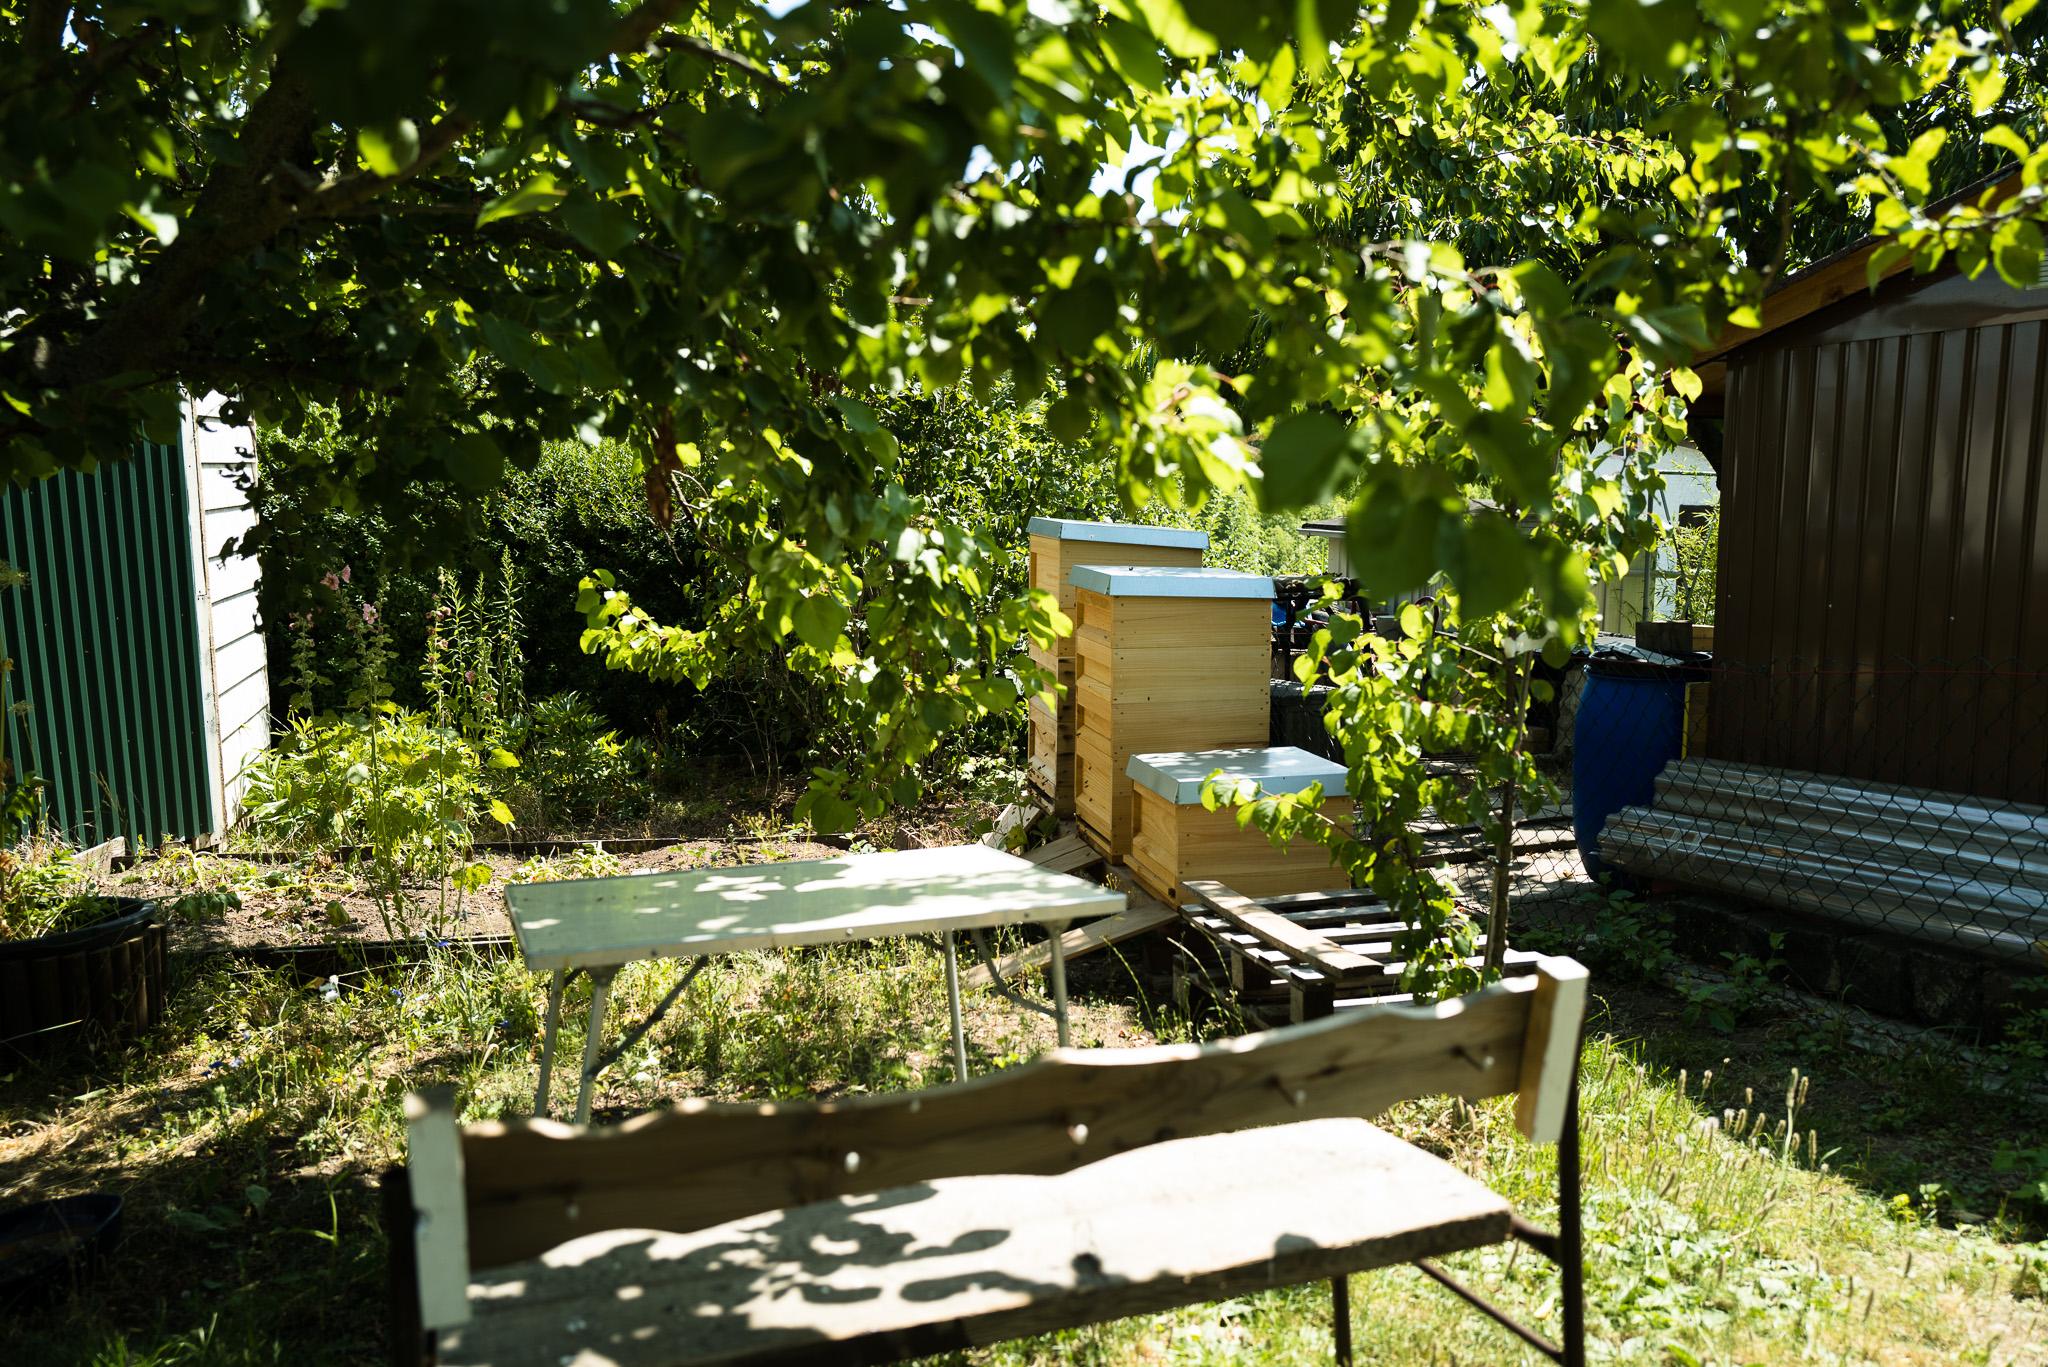 Bienenstoecke